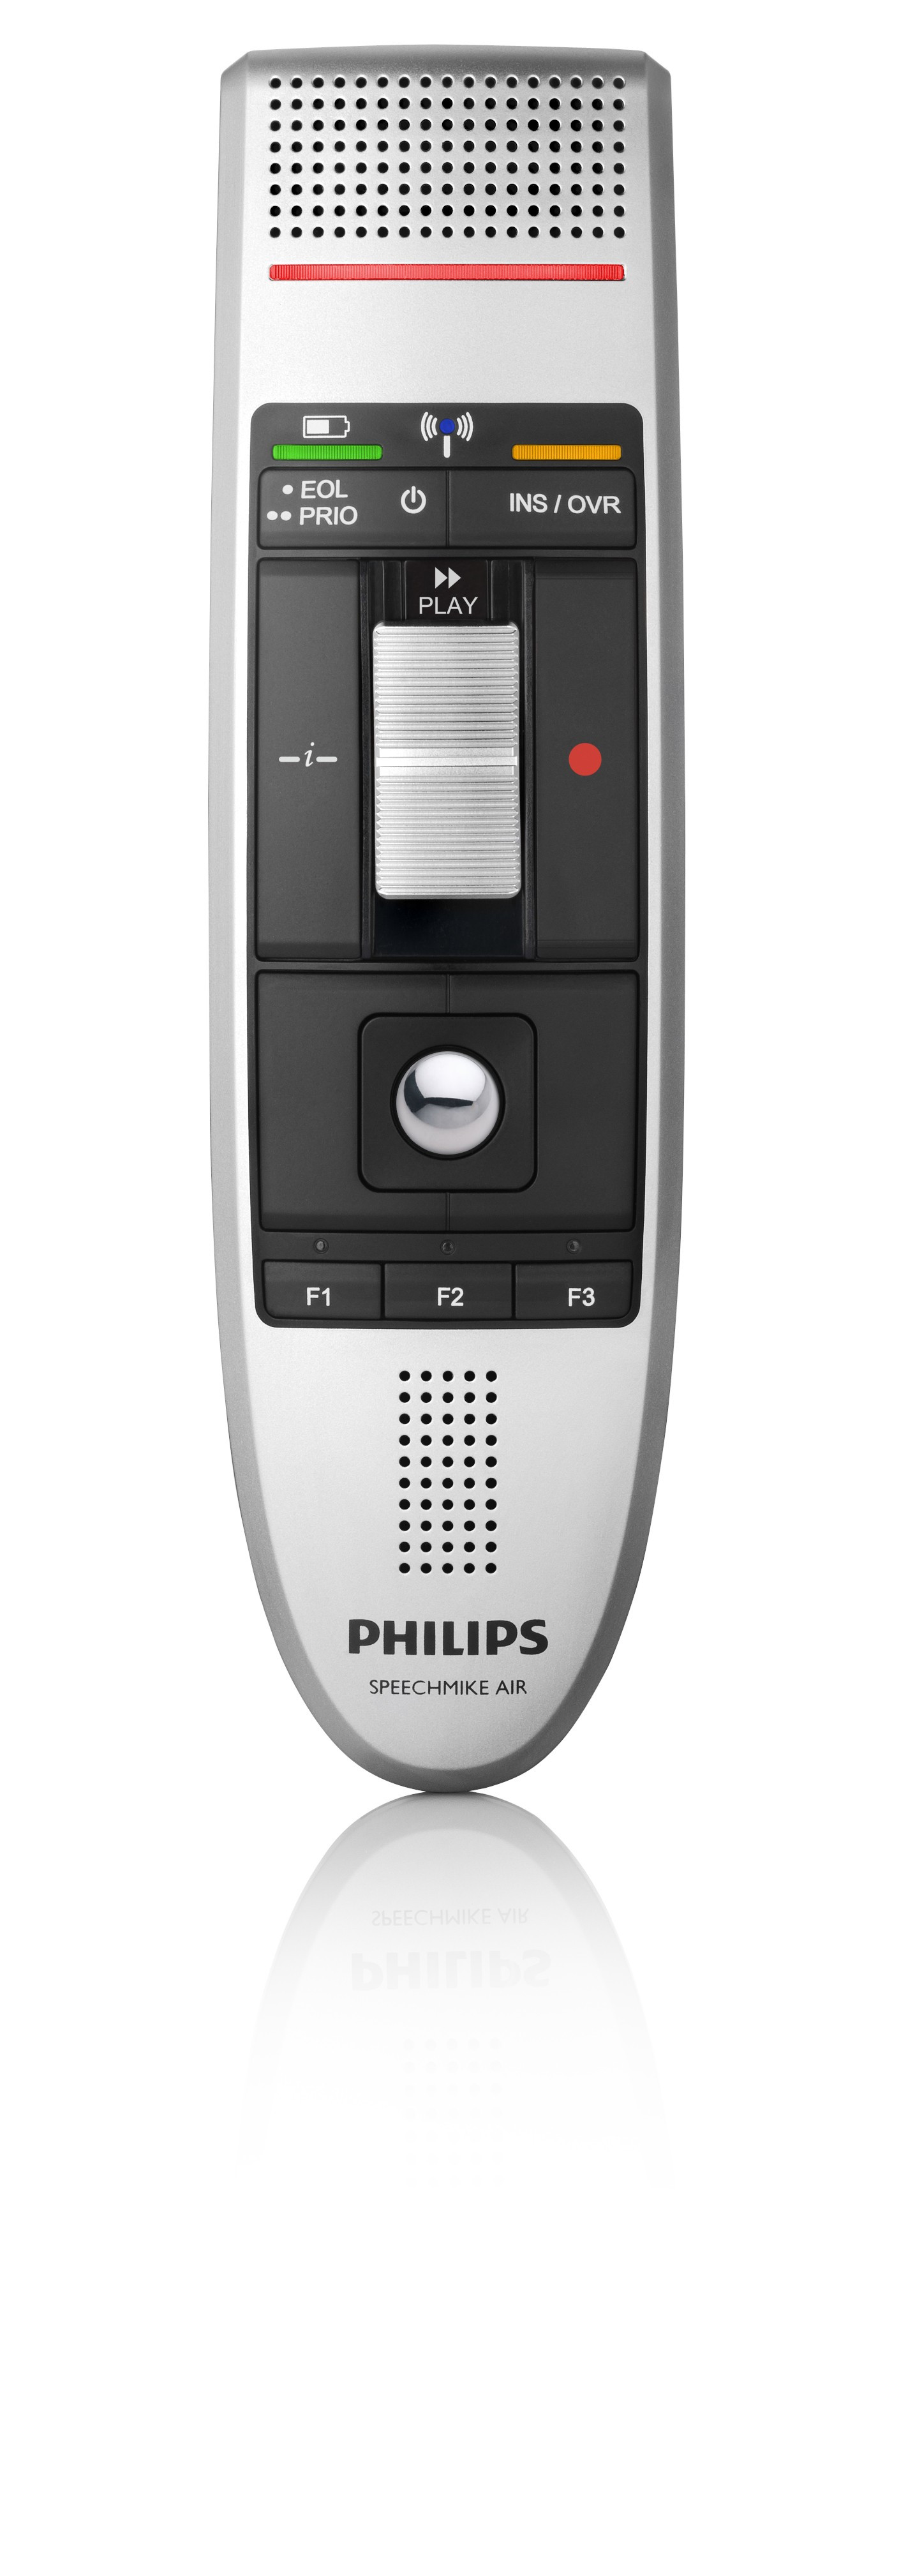 Philips LFH3020 SpeechMike Air Slider PHI Integrator Version